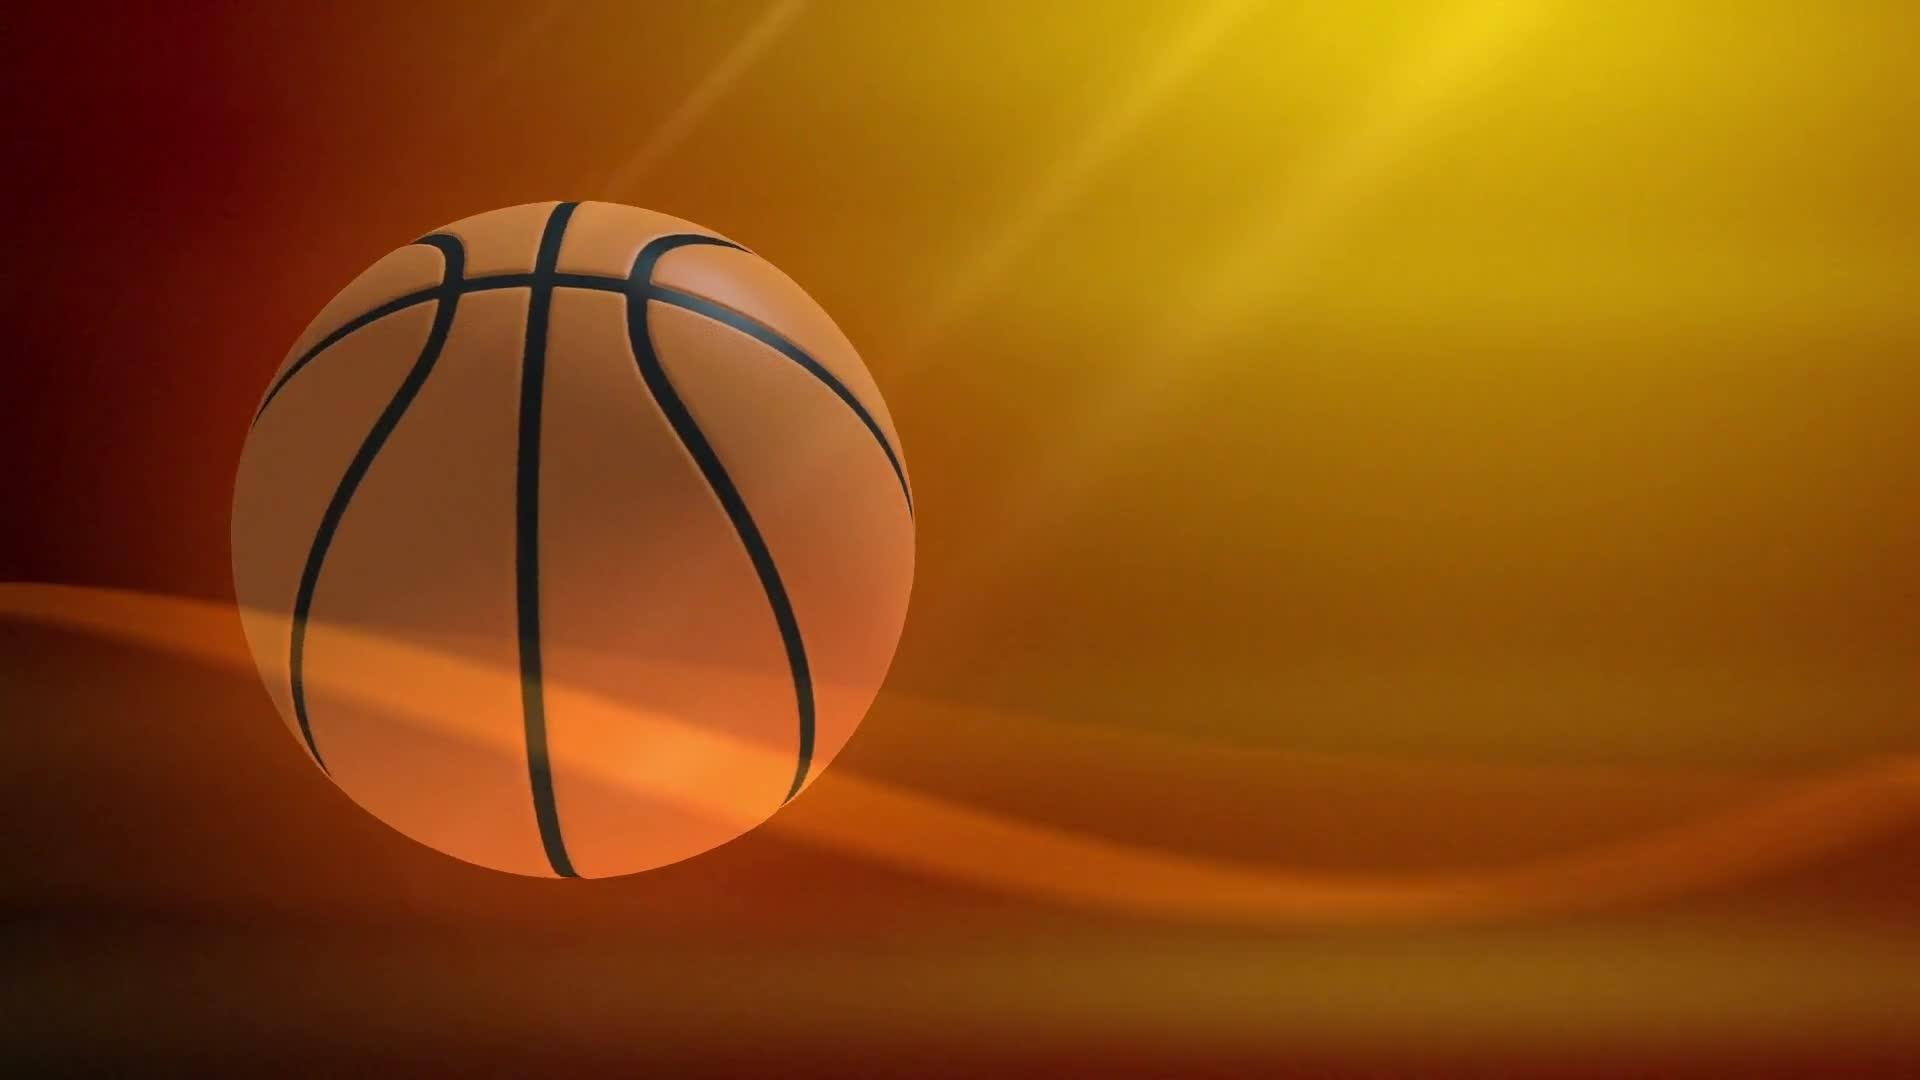 Basketball best background